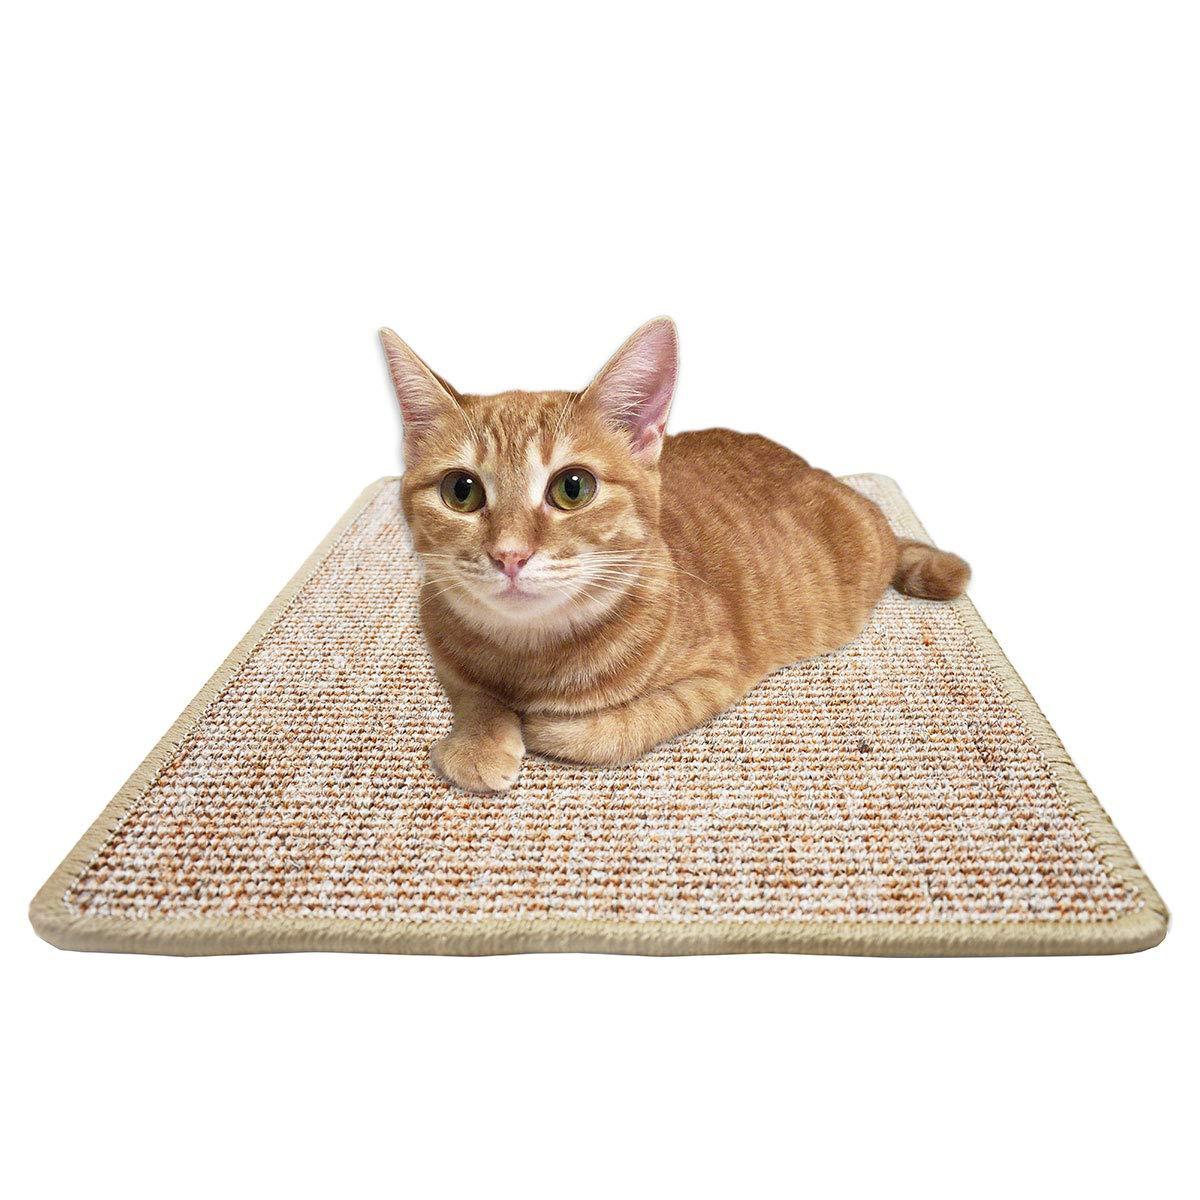 FUKUMARU Cat Scratcher Mat,Natural Sisal Rope Cat Scratching Carpet Pad,Floor Scratching Rug by FUKUMARU (Image #1)